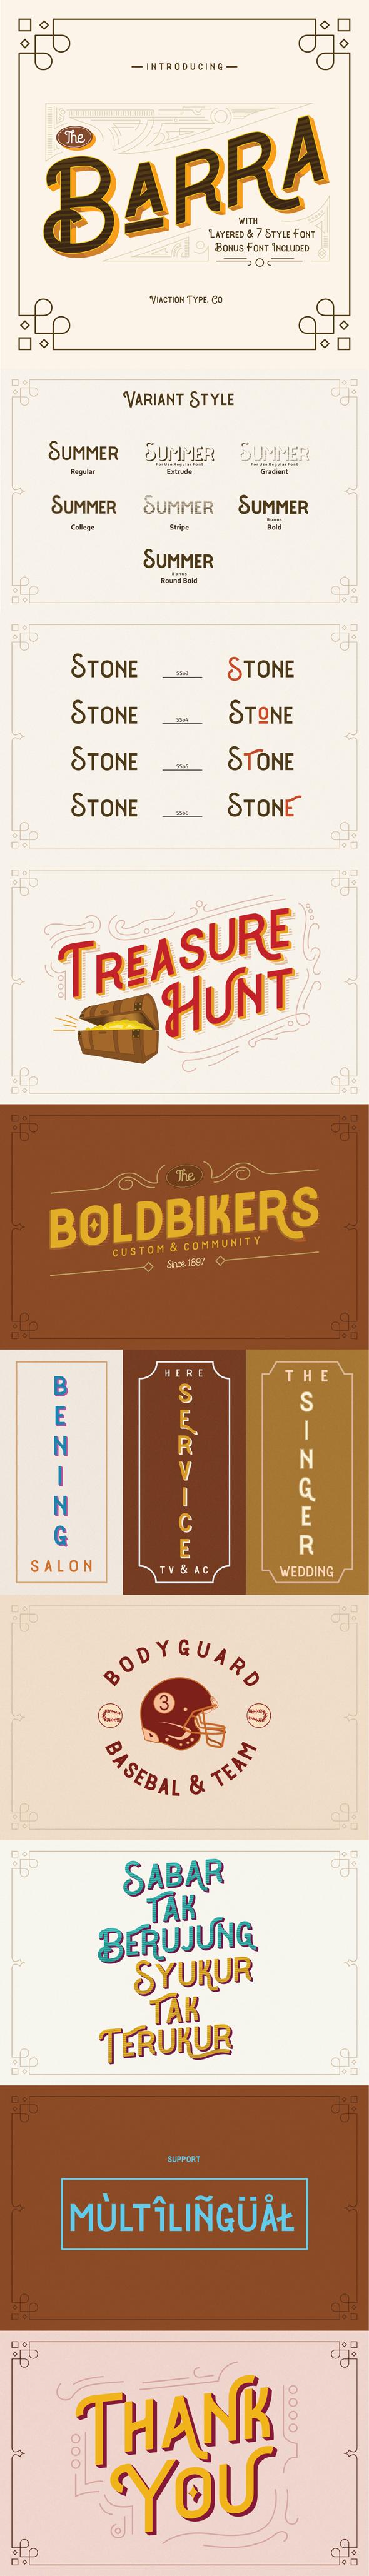 The Barra Typeface - Miscellaneous Sans-Serif